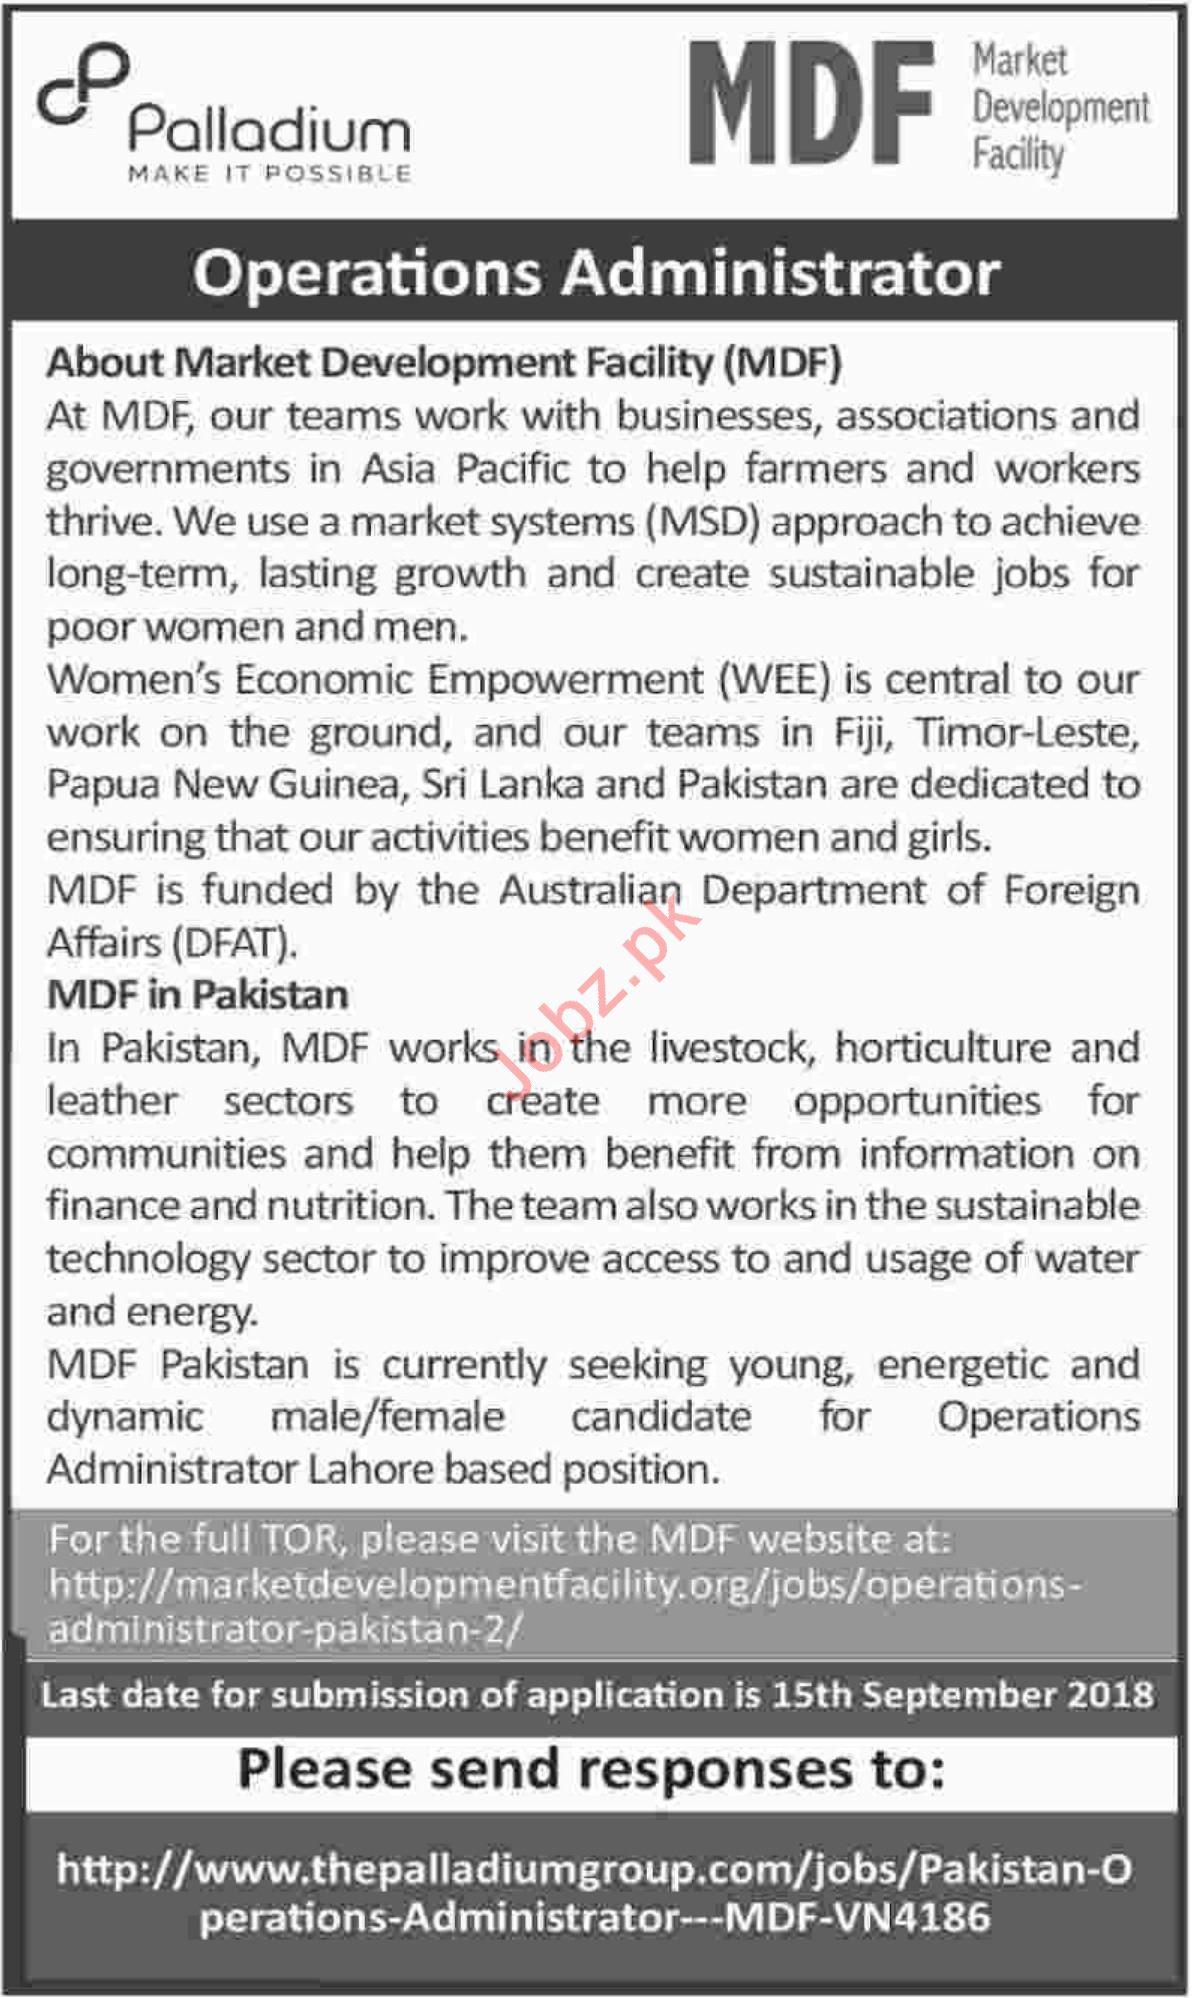 Operations Administrators for Market Development Facility